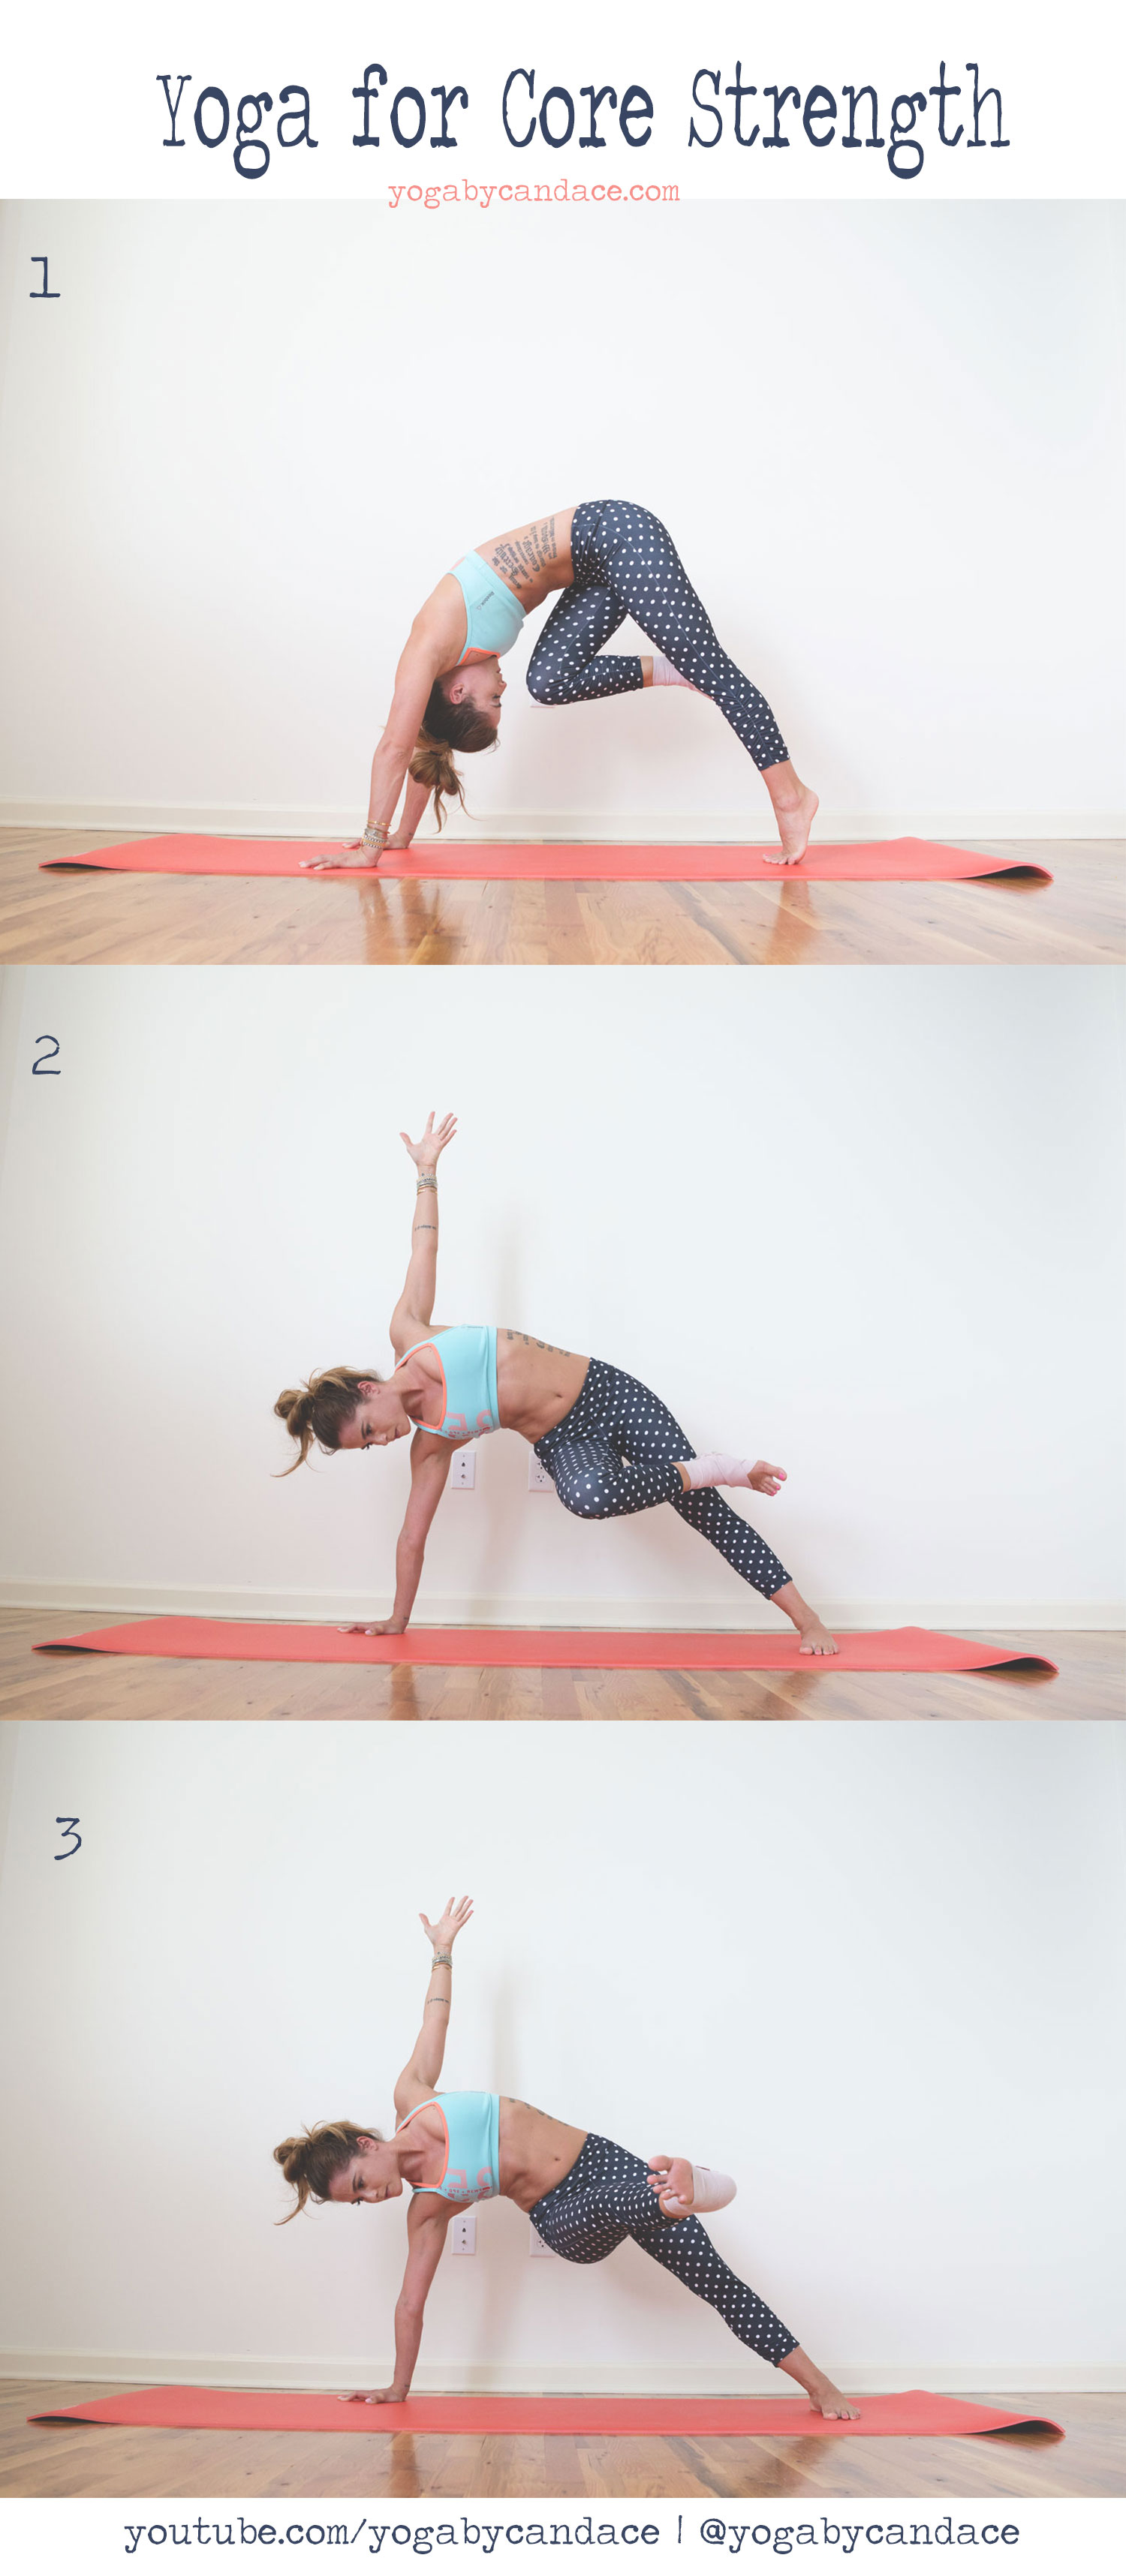 Pin now, practice later to improve your core strength   Wearing:  Kira Grace leggings  ,  Reebok bra  .